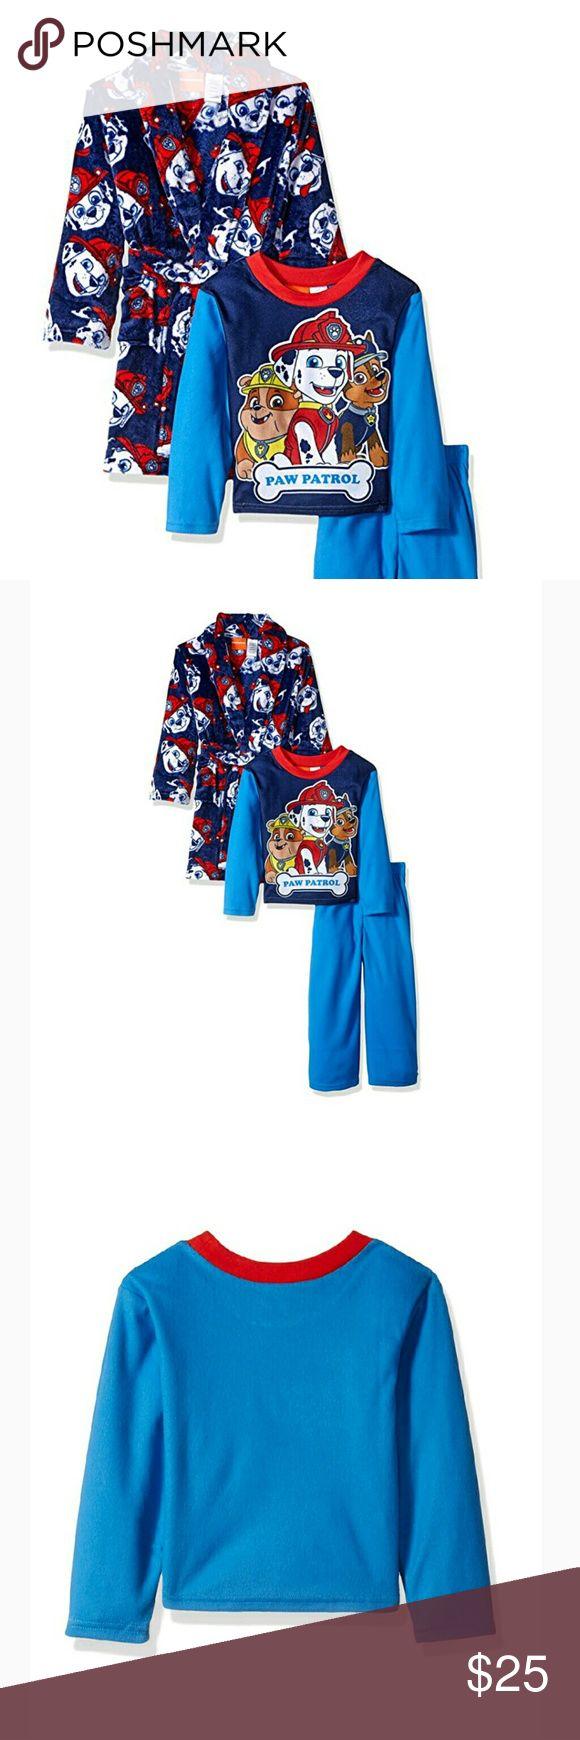 Paw Patrol Robe & Pajama Set Brand new with tags Paw Patrol fleece robe and pajamas. Your little Paw Patrol fan will love it!!! Sizes 6-7 and 8-9 available. Nickelodeon Pajamas Pajama Sets